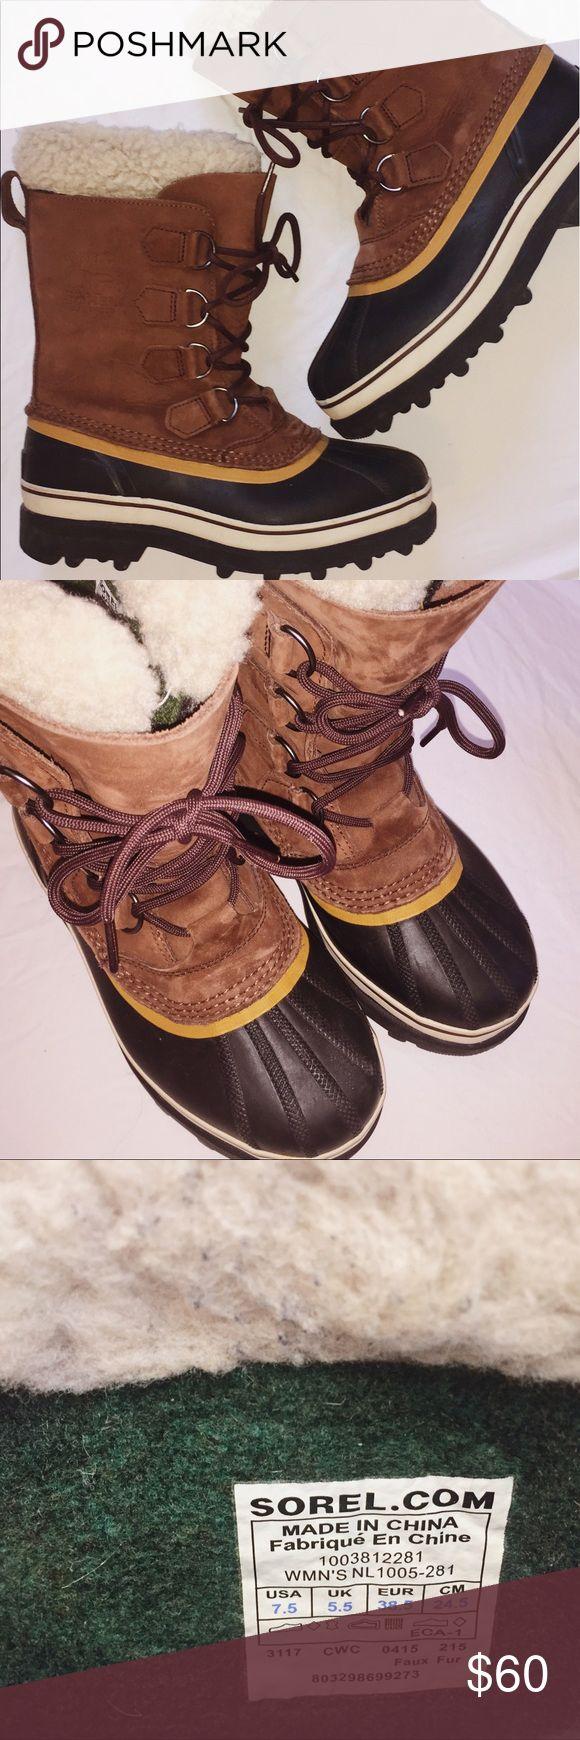 Women's Sorel snow boots (Caribou waterproof) Women's Sorel snow boots. Great condition. Warm fur lining. Waterproof. Worn for one season (maybe 5 times). Sorel Shoes Winter & Rain Boots